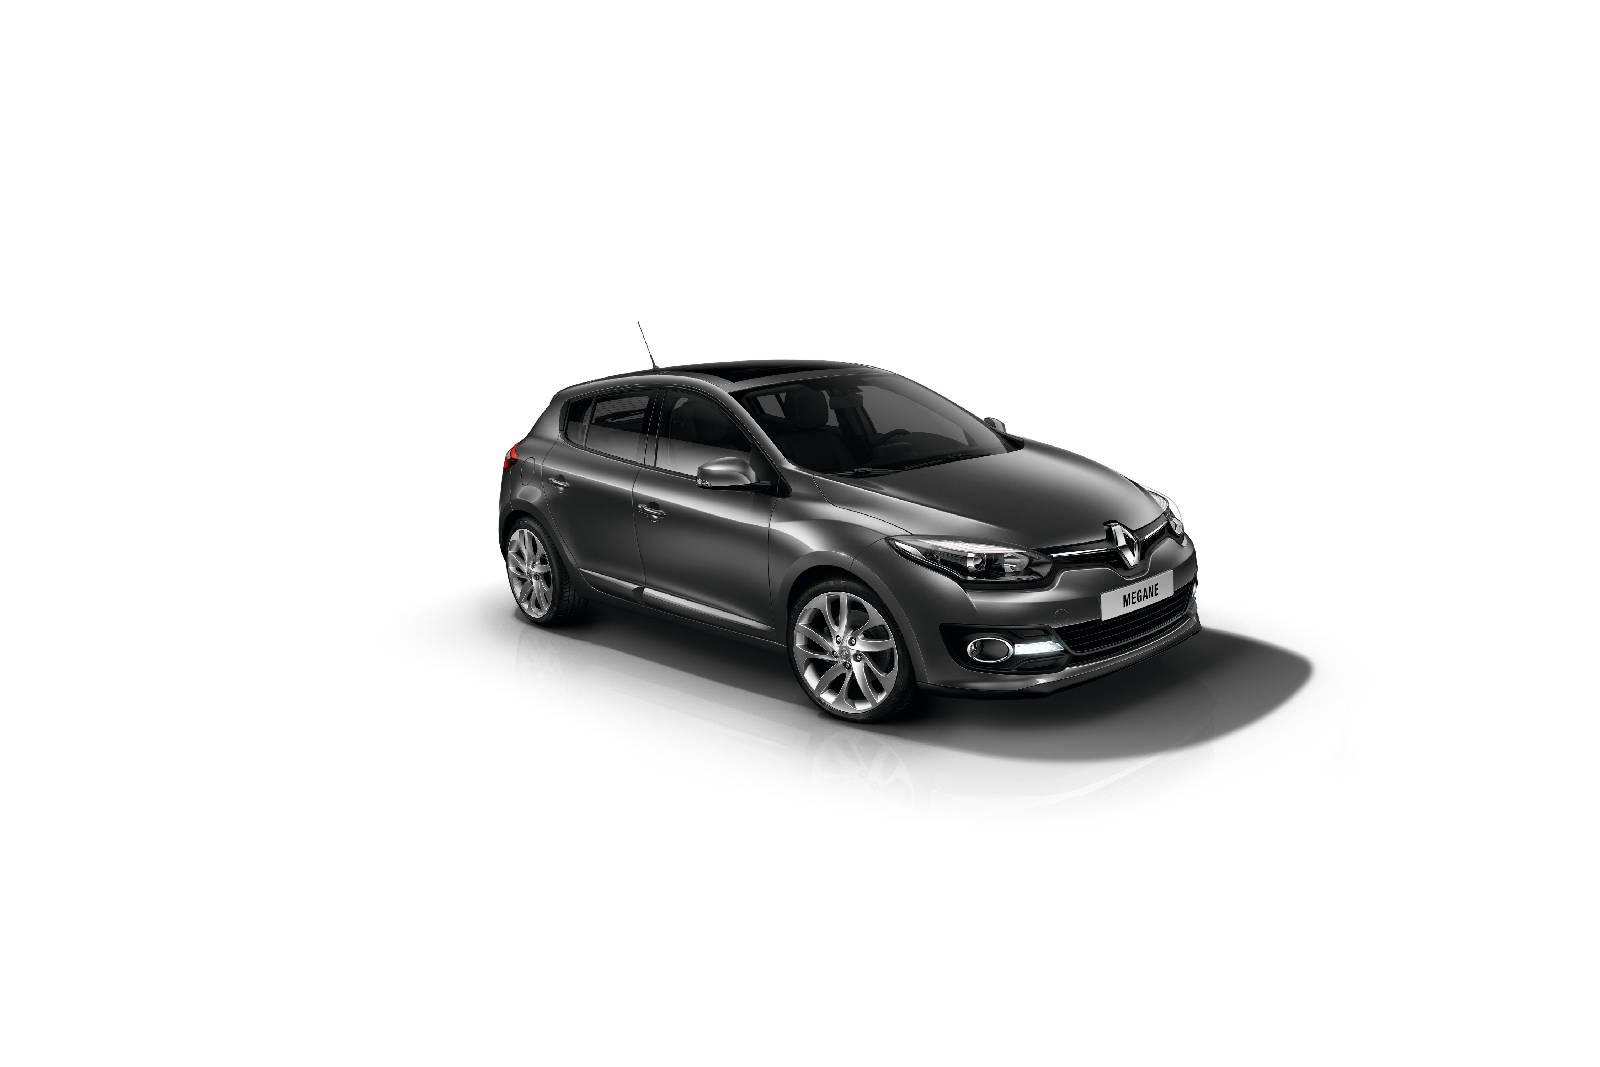 Renault Megane 2014 6